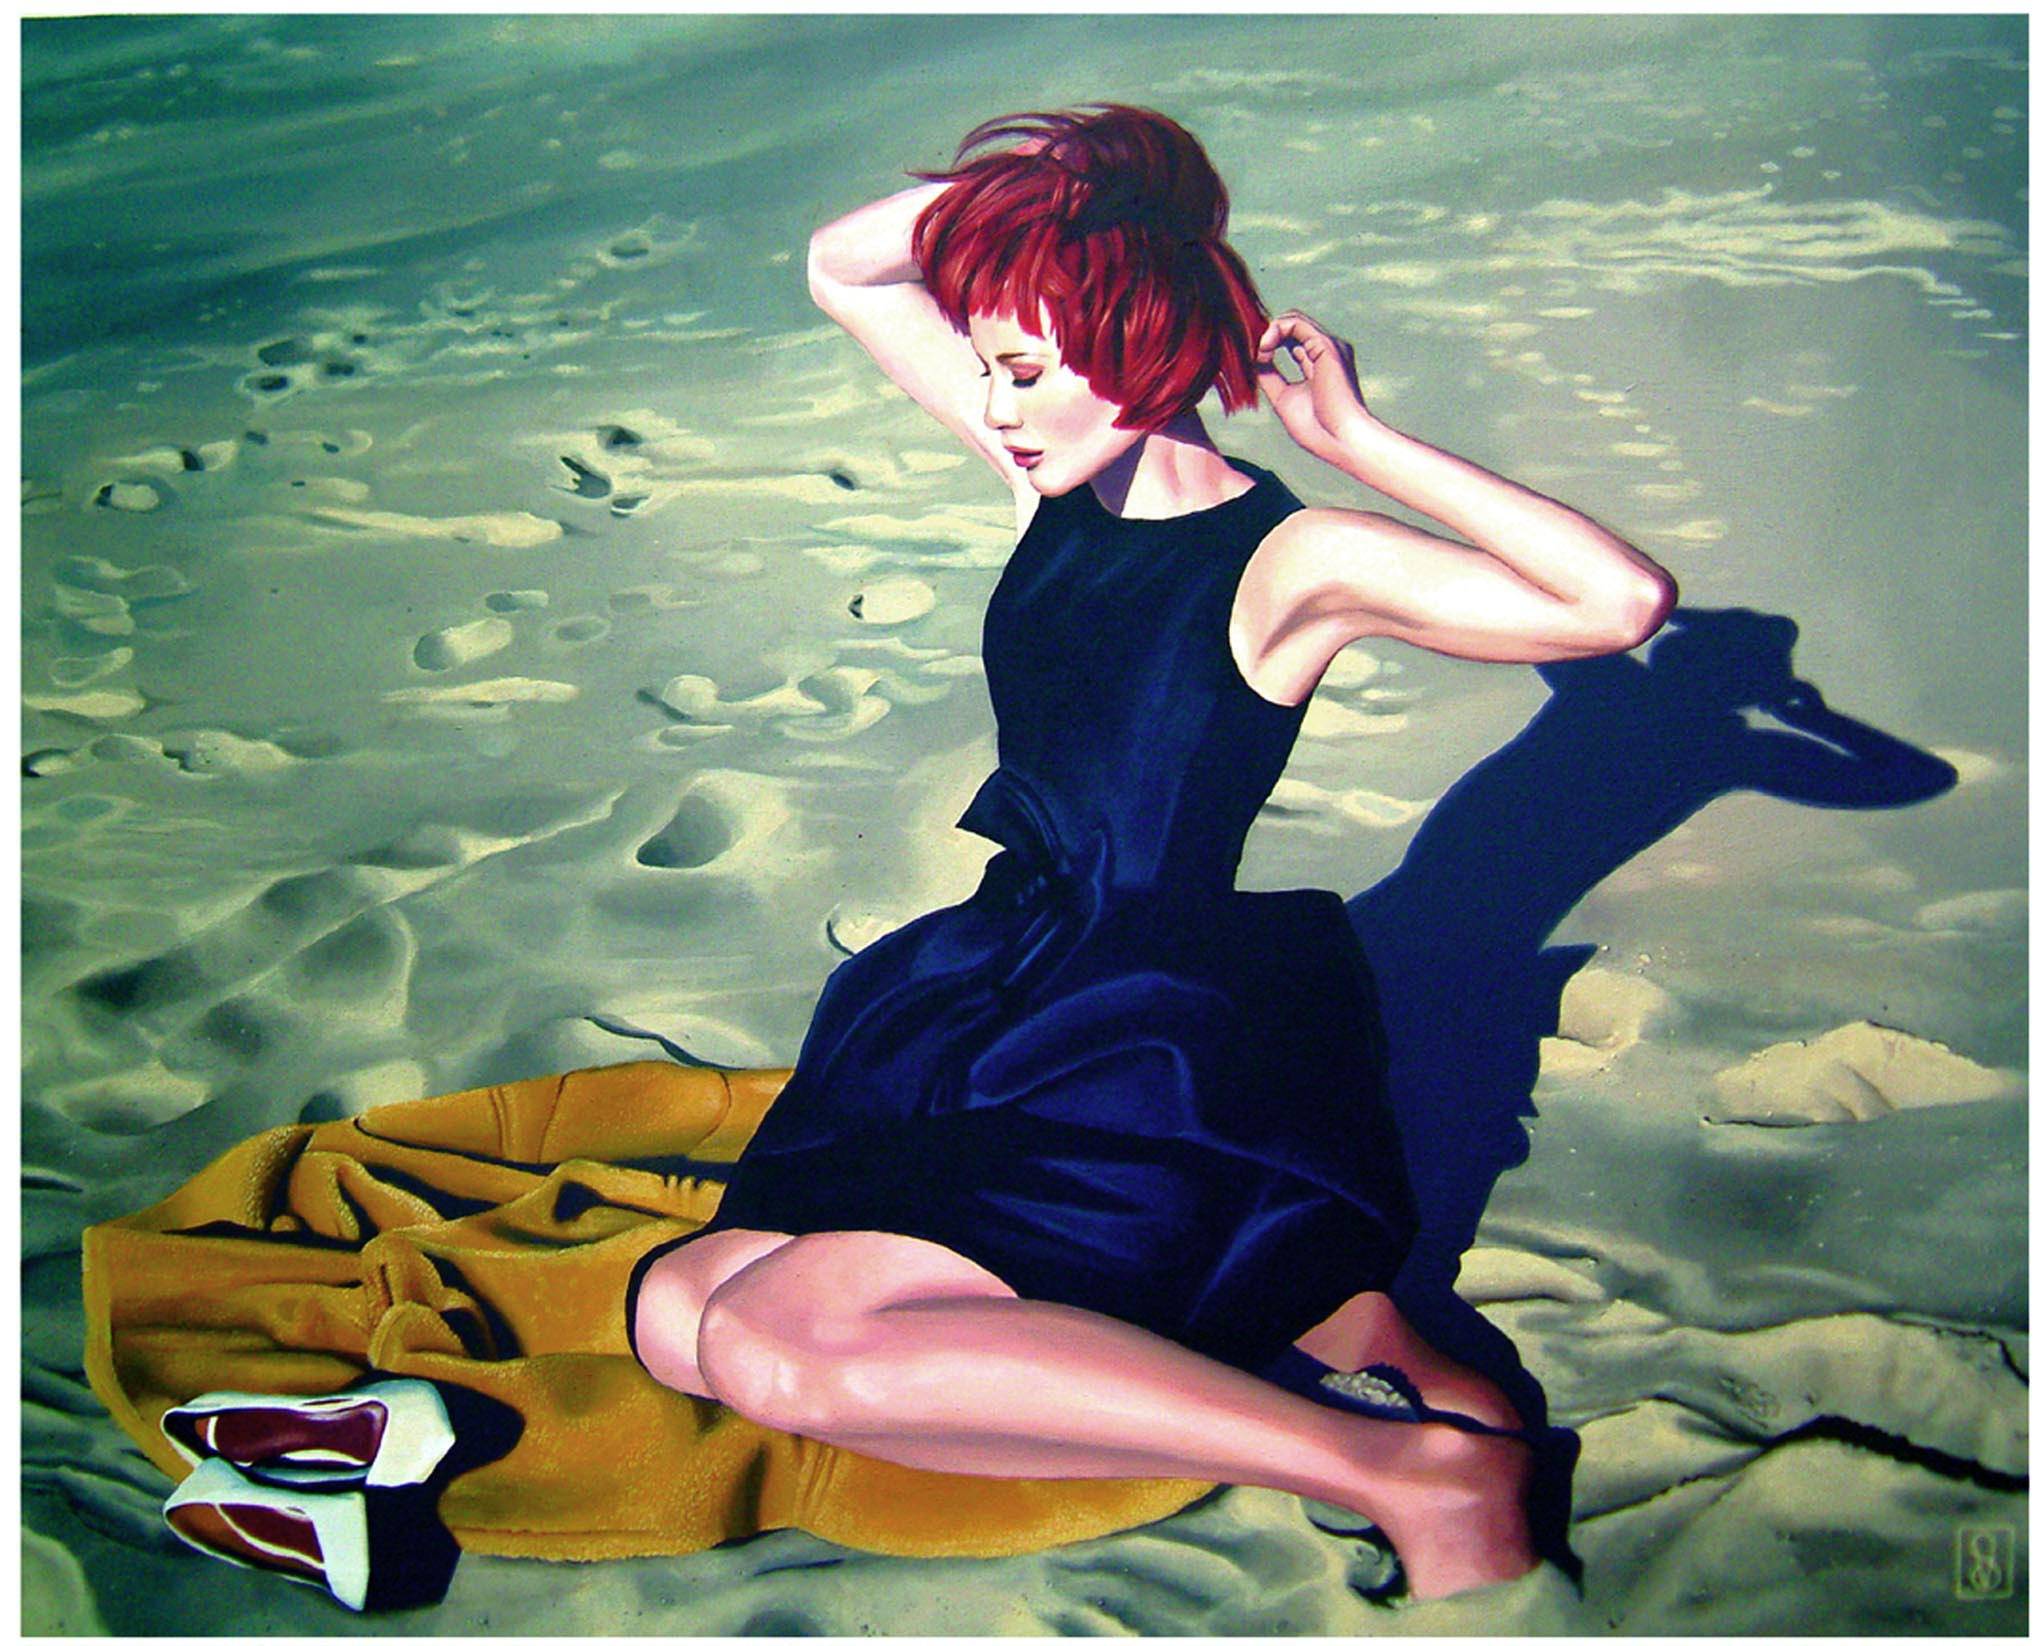 Vicky Sanders Realistic - Girl on Beach